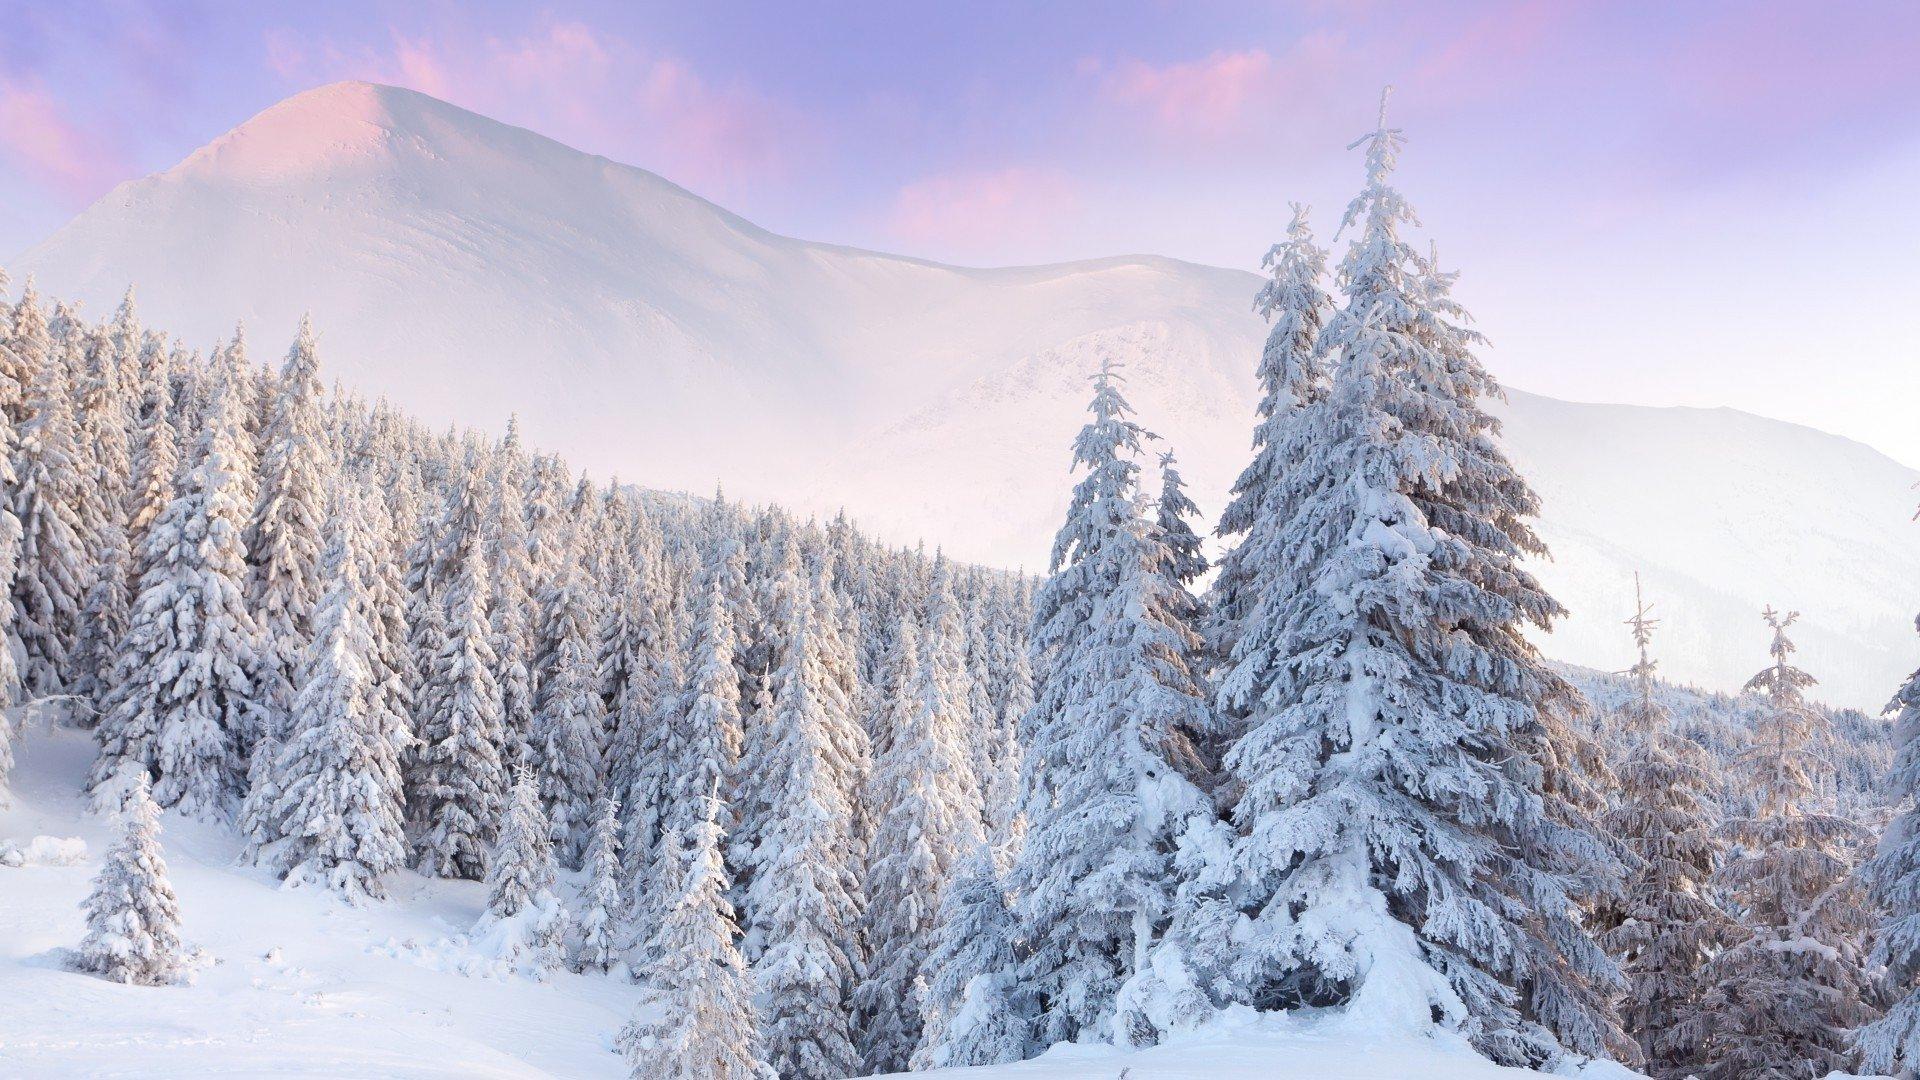 Winter Aesthetic Wallpaper Full HD